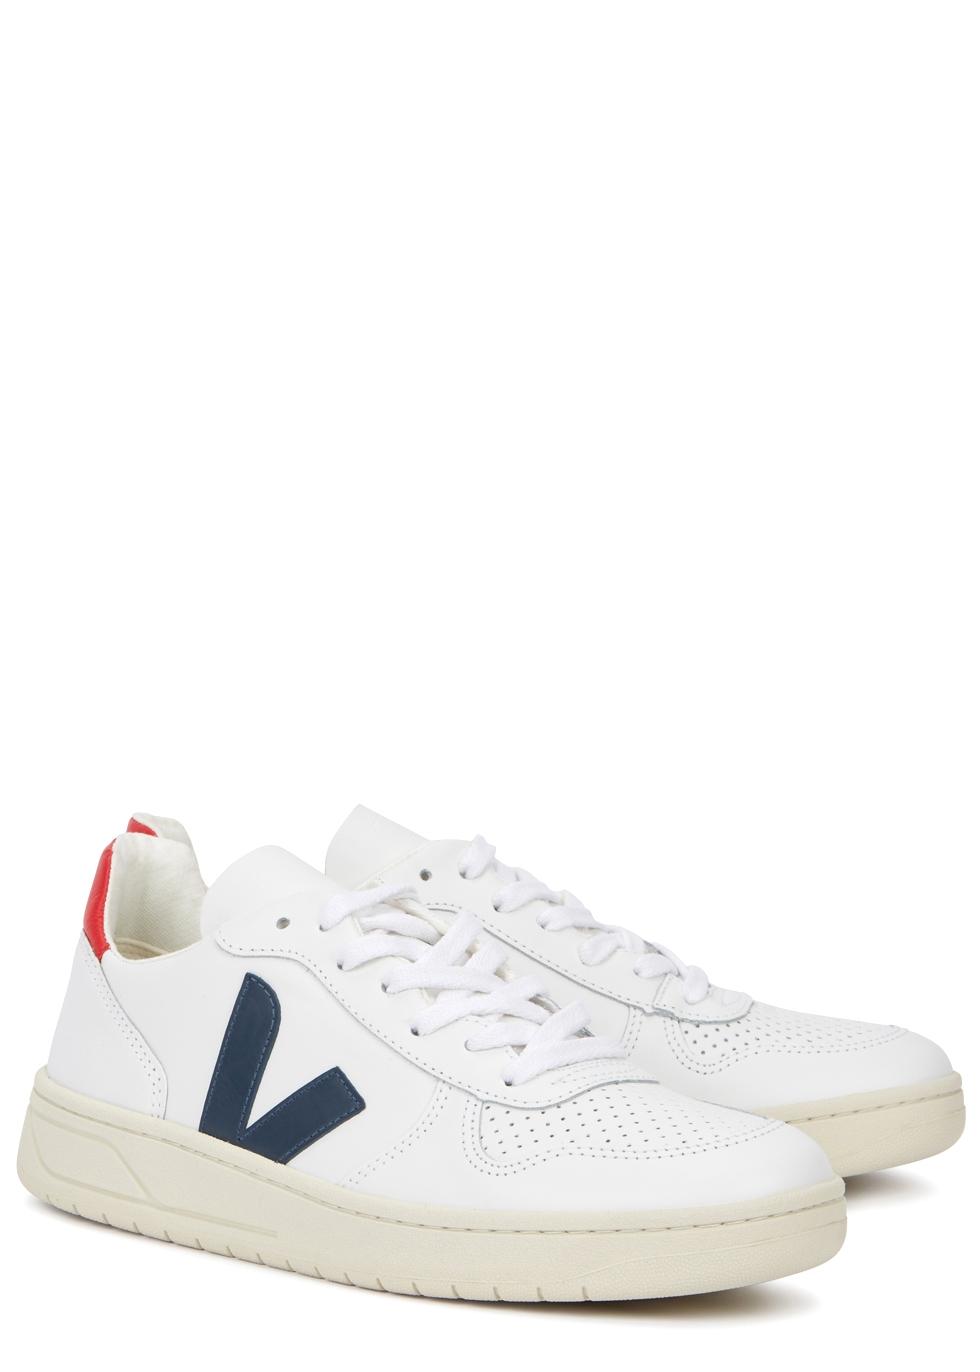 Veja V-10 white leather sneakers